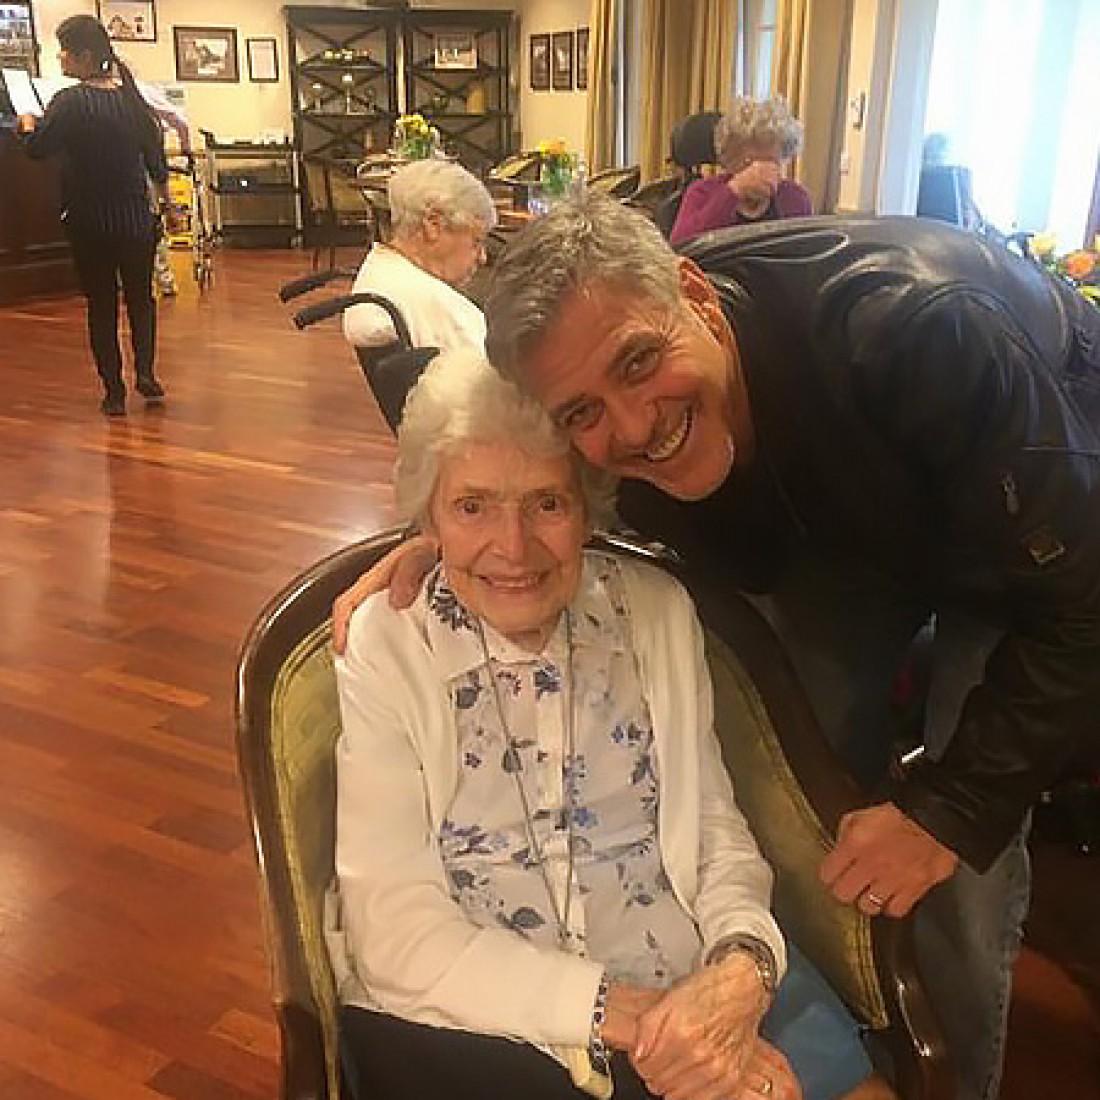 Джордж Клуни навестил 87-летнюю поклонницу